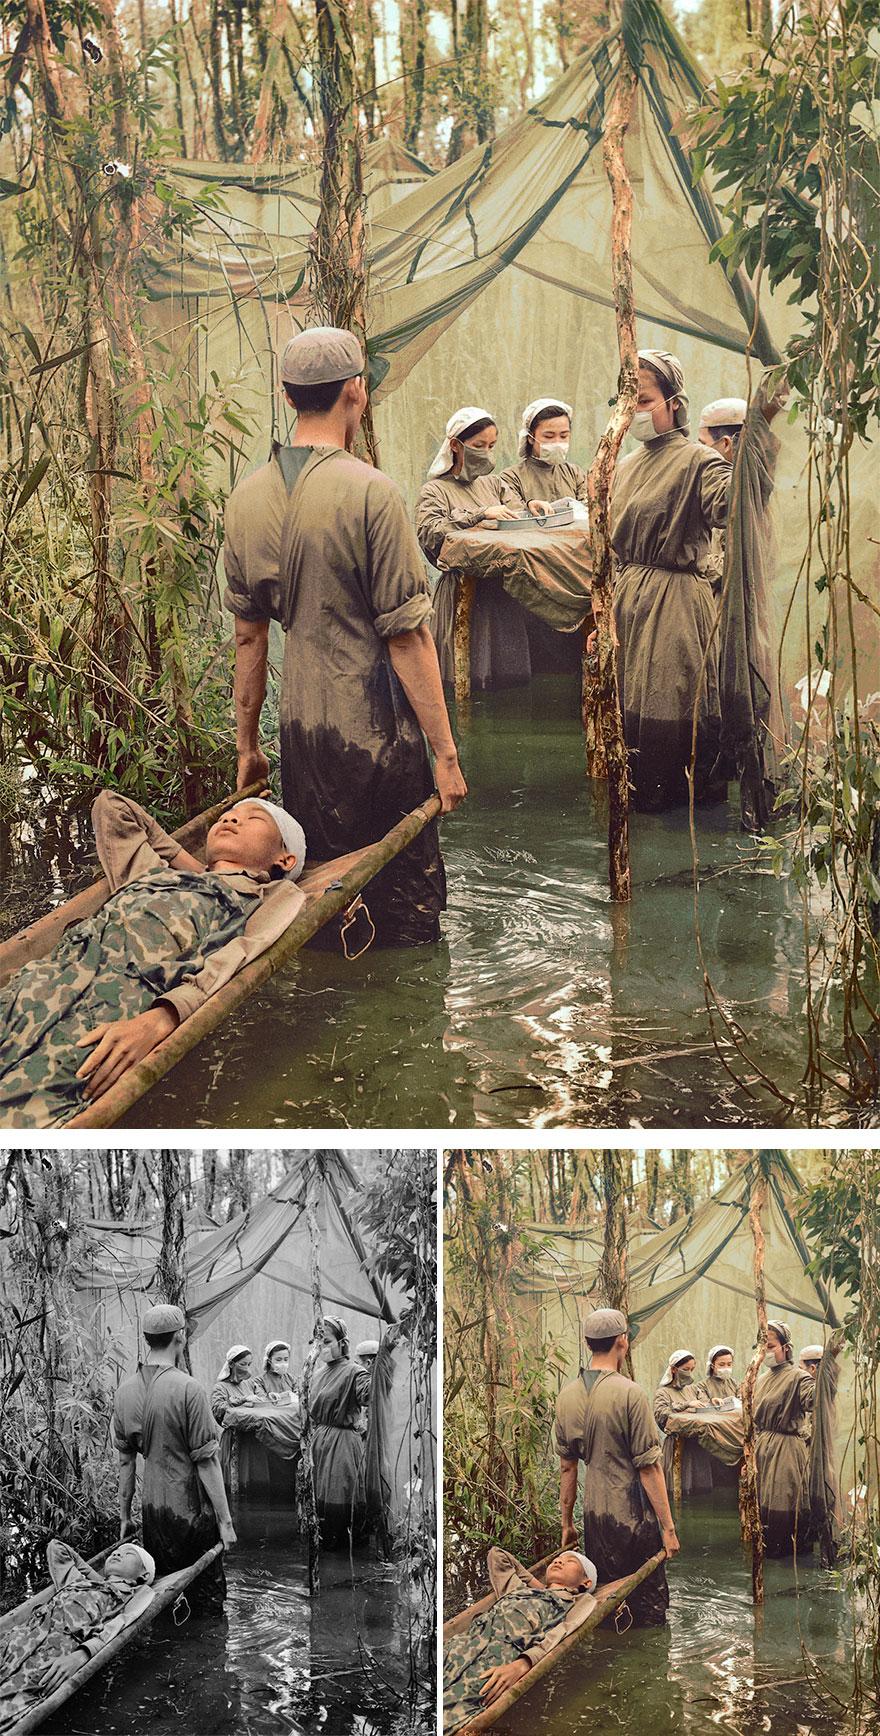 Jungle hospital A Victim Of American Bombing